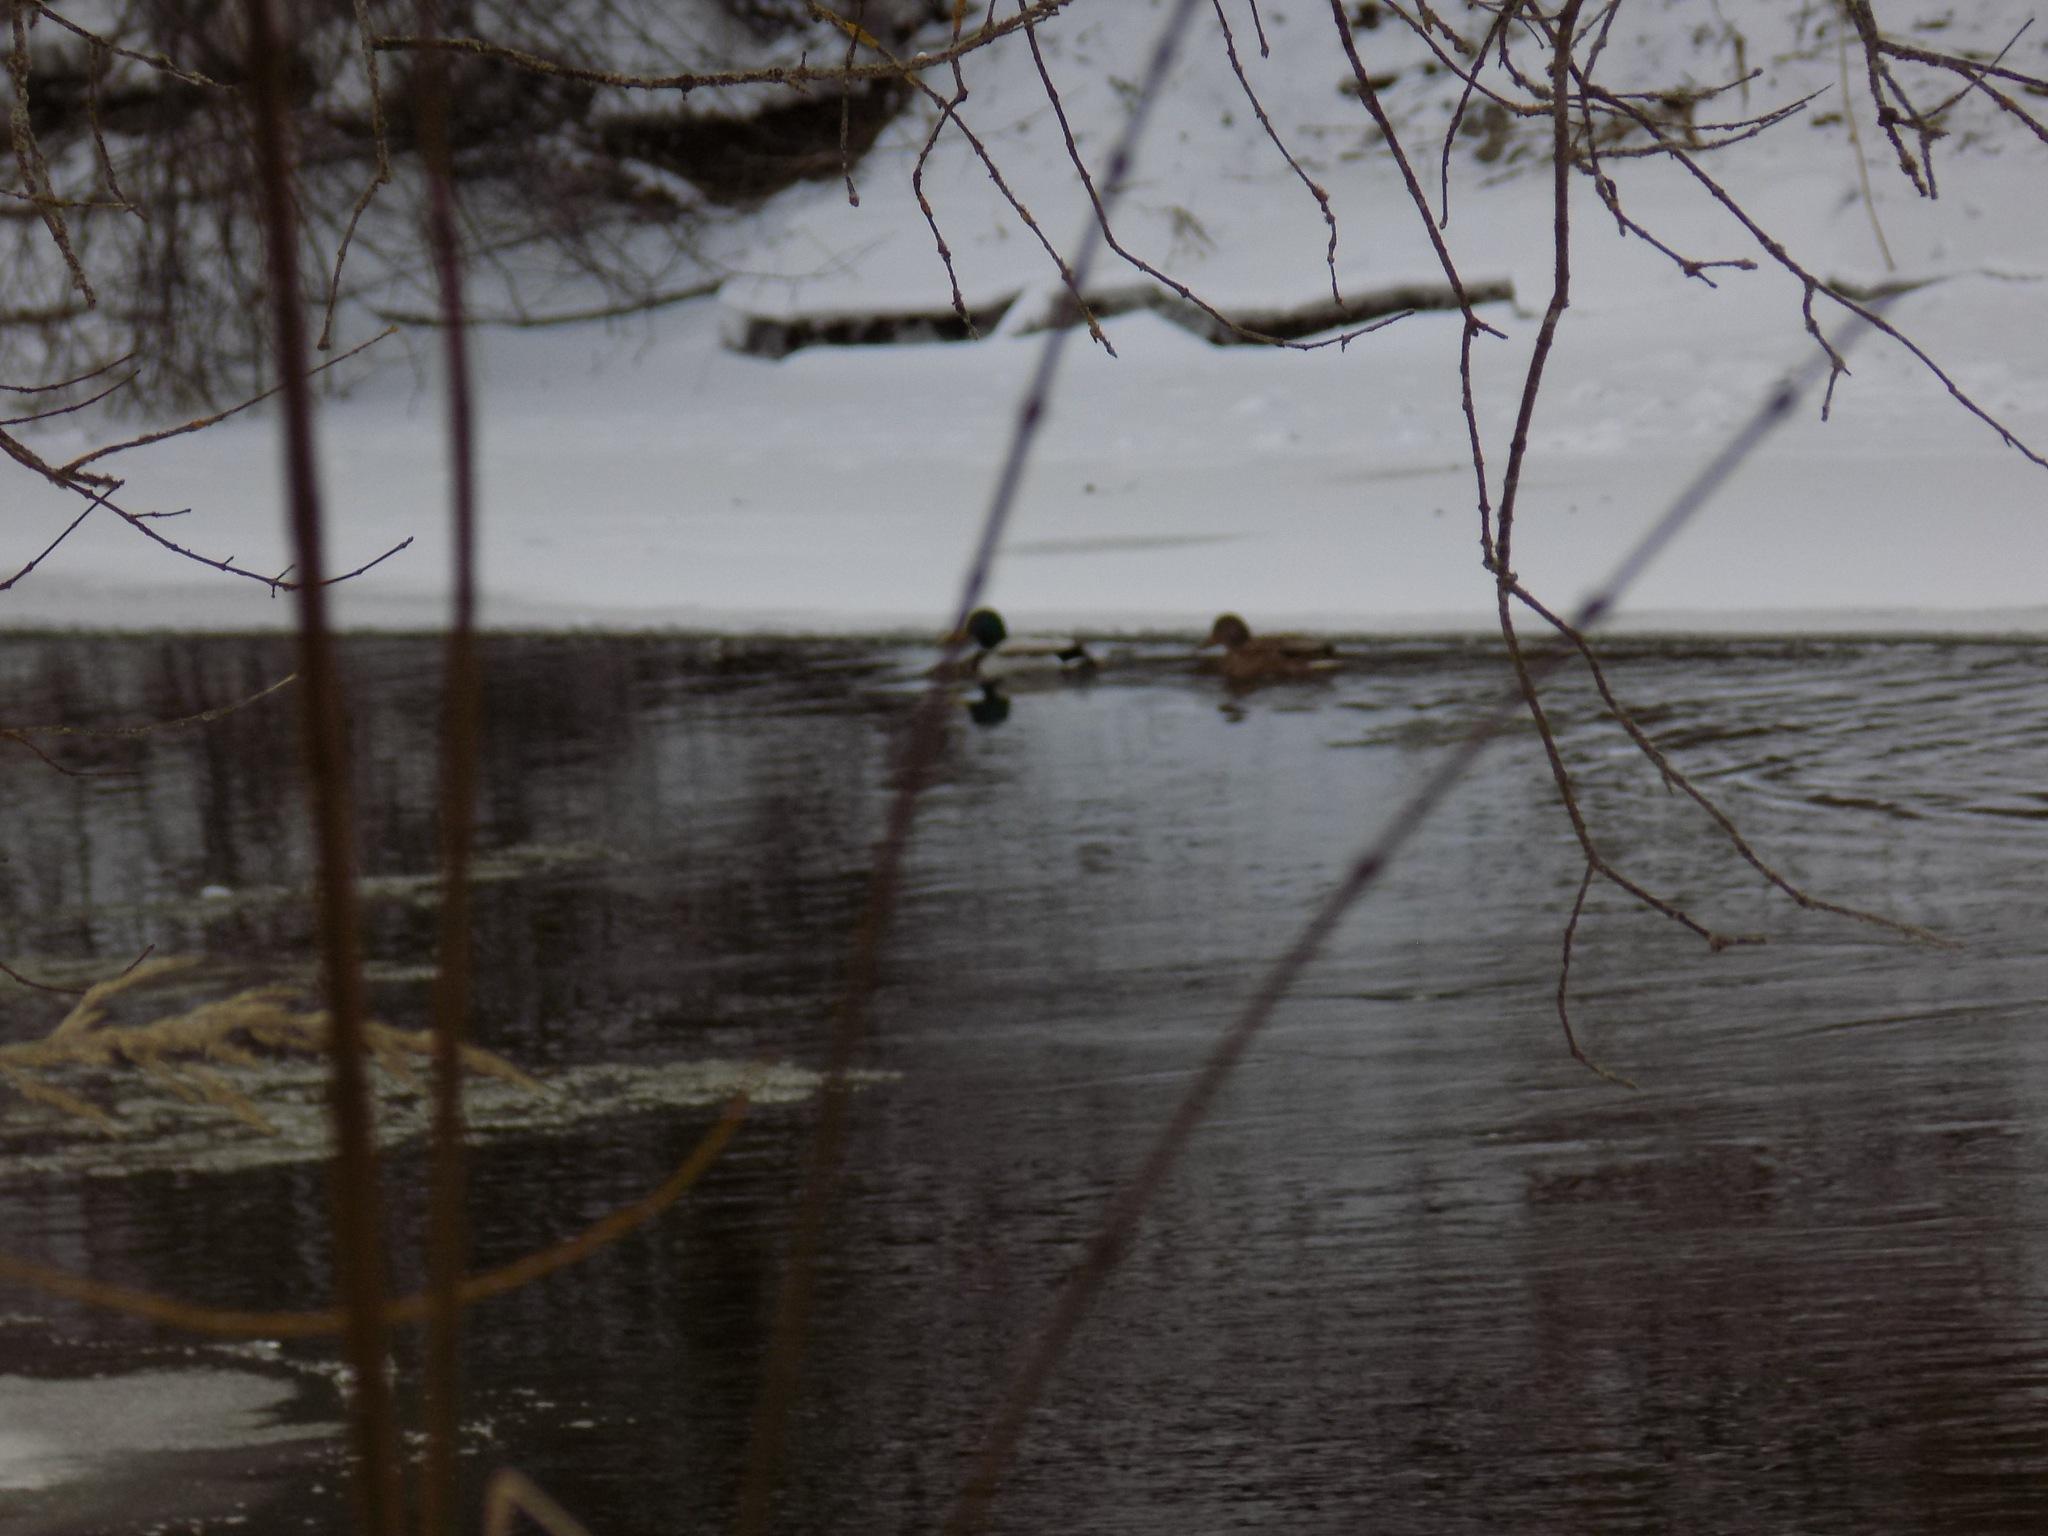 Gray winter day by uzkuraitiene62